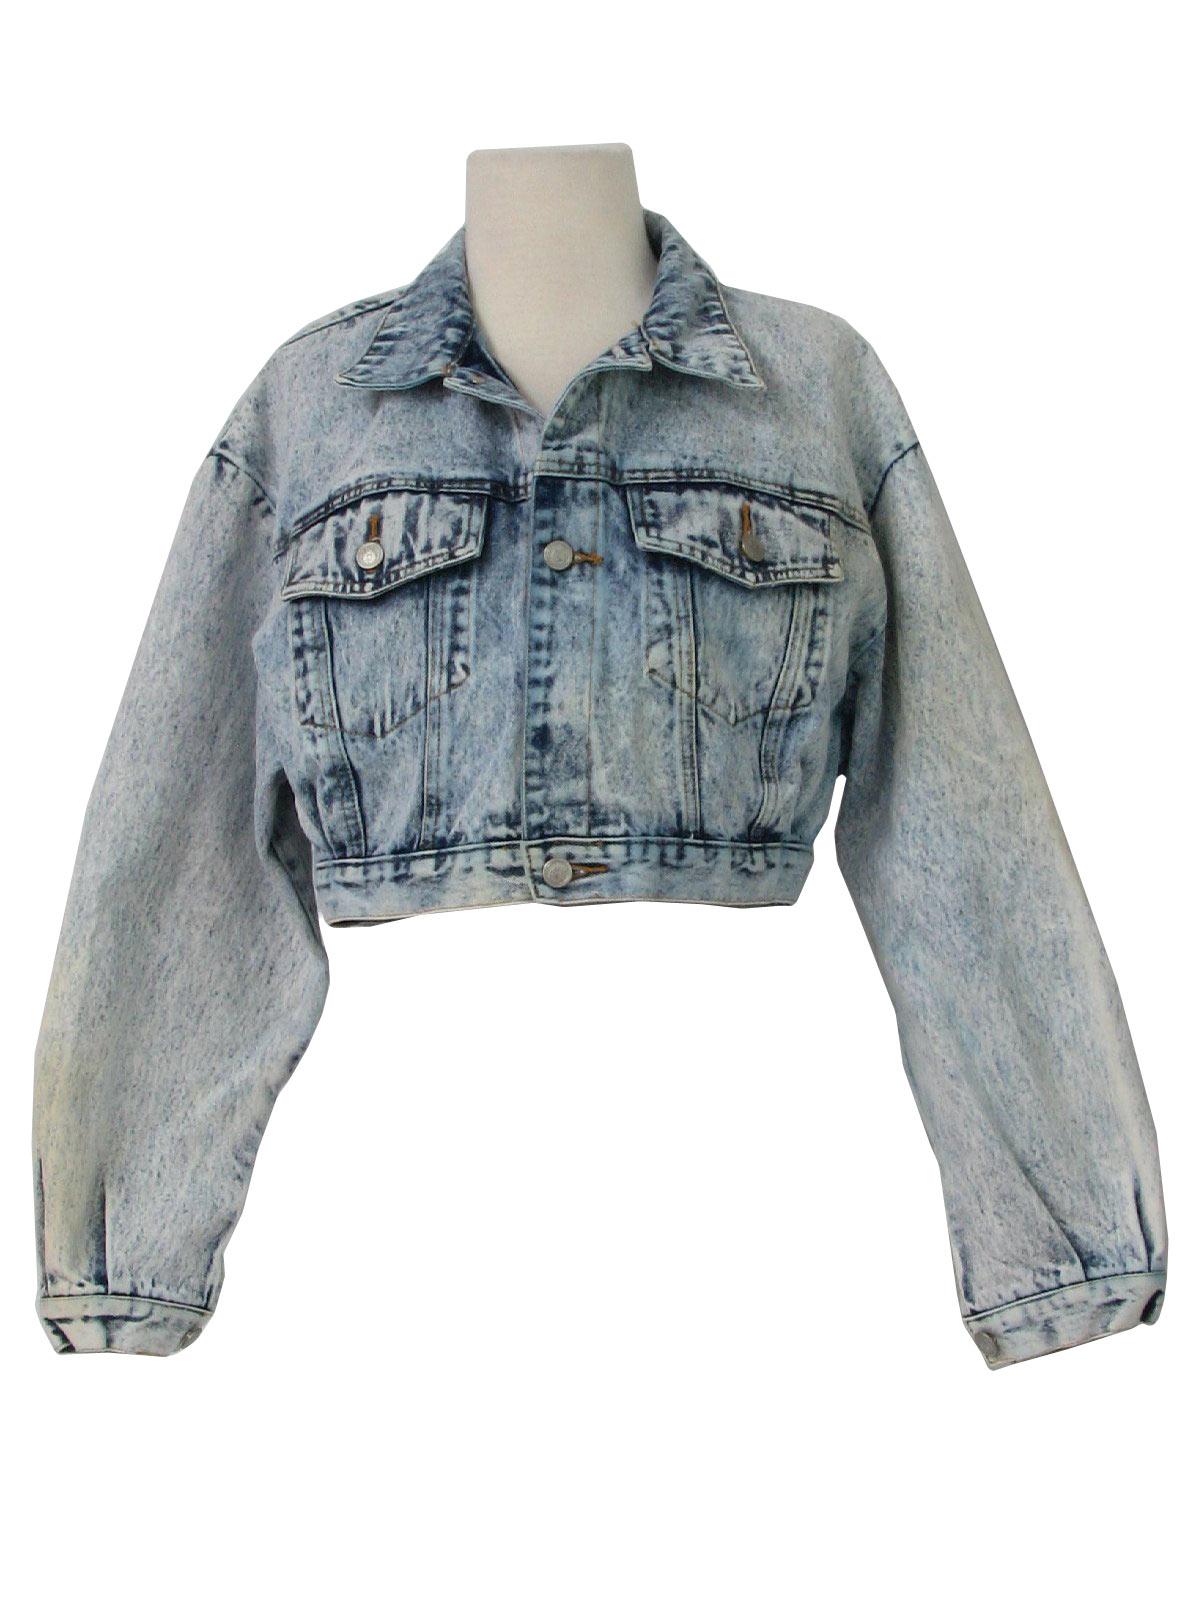 f52475bc0e0 Vintage 80s Jacket  80s -Contempo Casuals- Womens white and dark ...